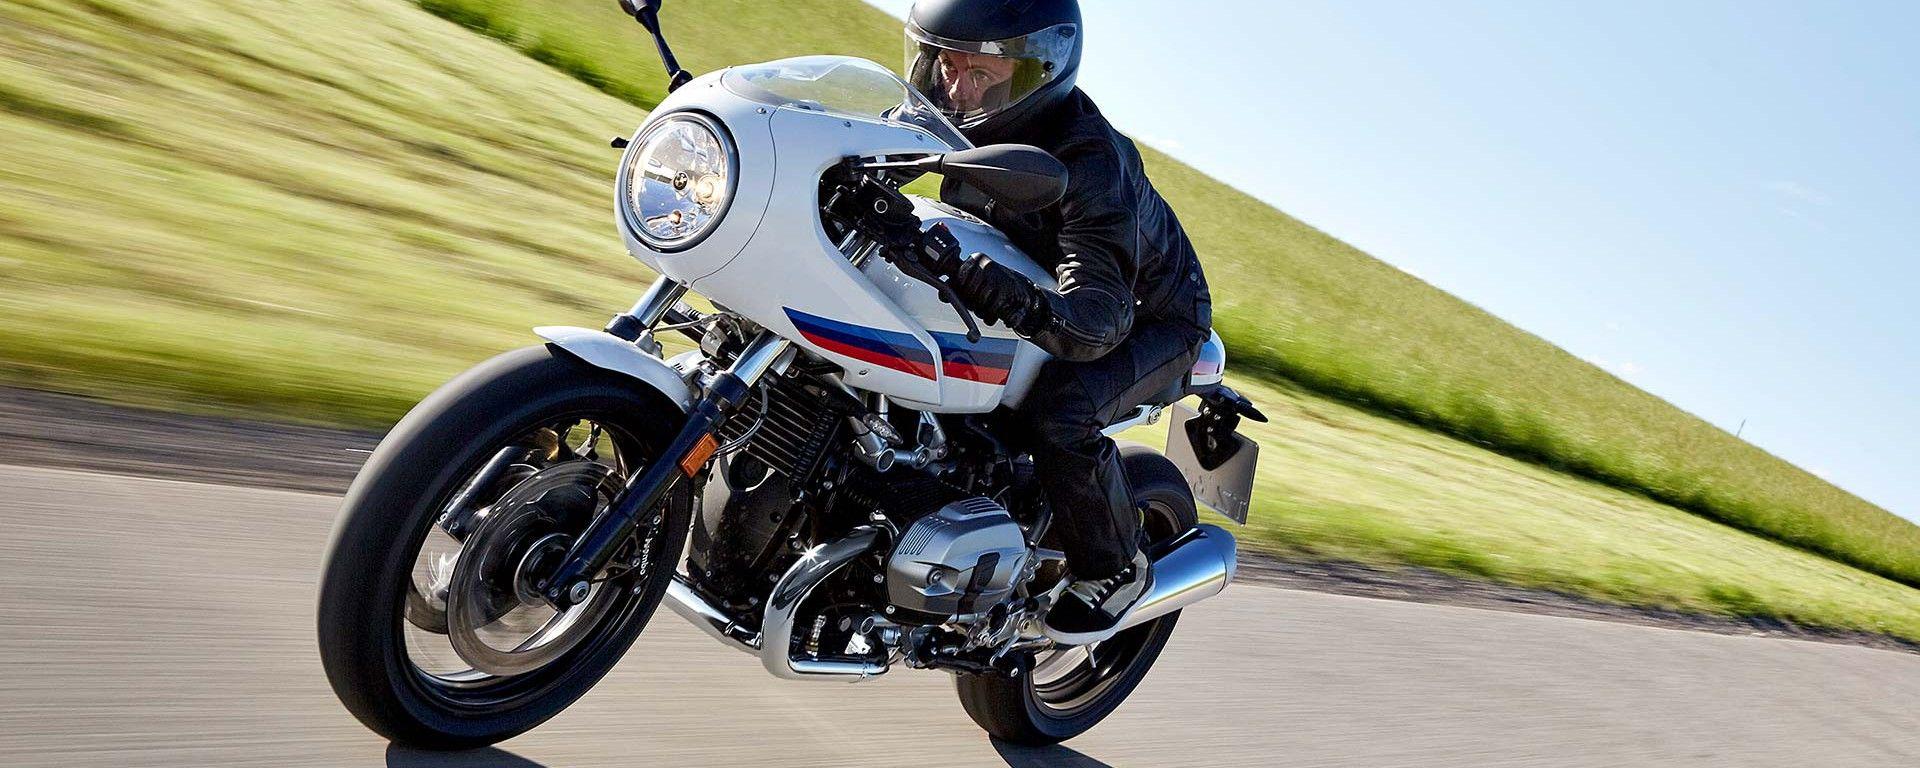 BMW R nineT Racer: una special già fatta e finita